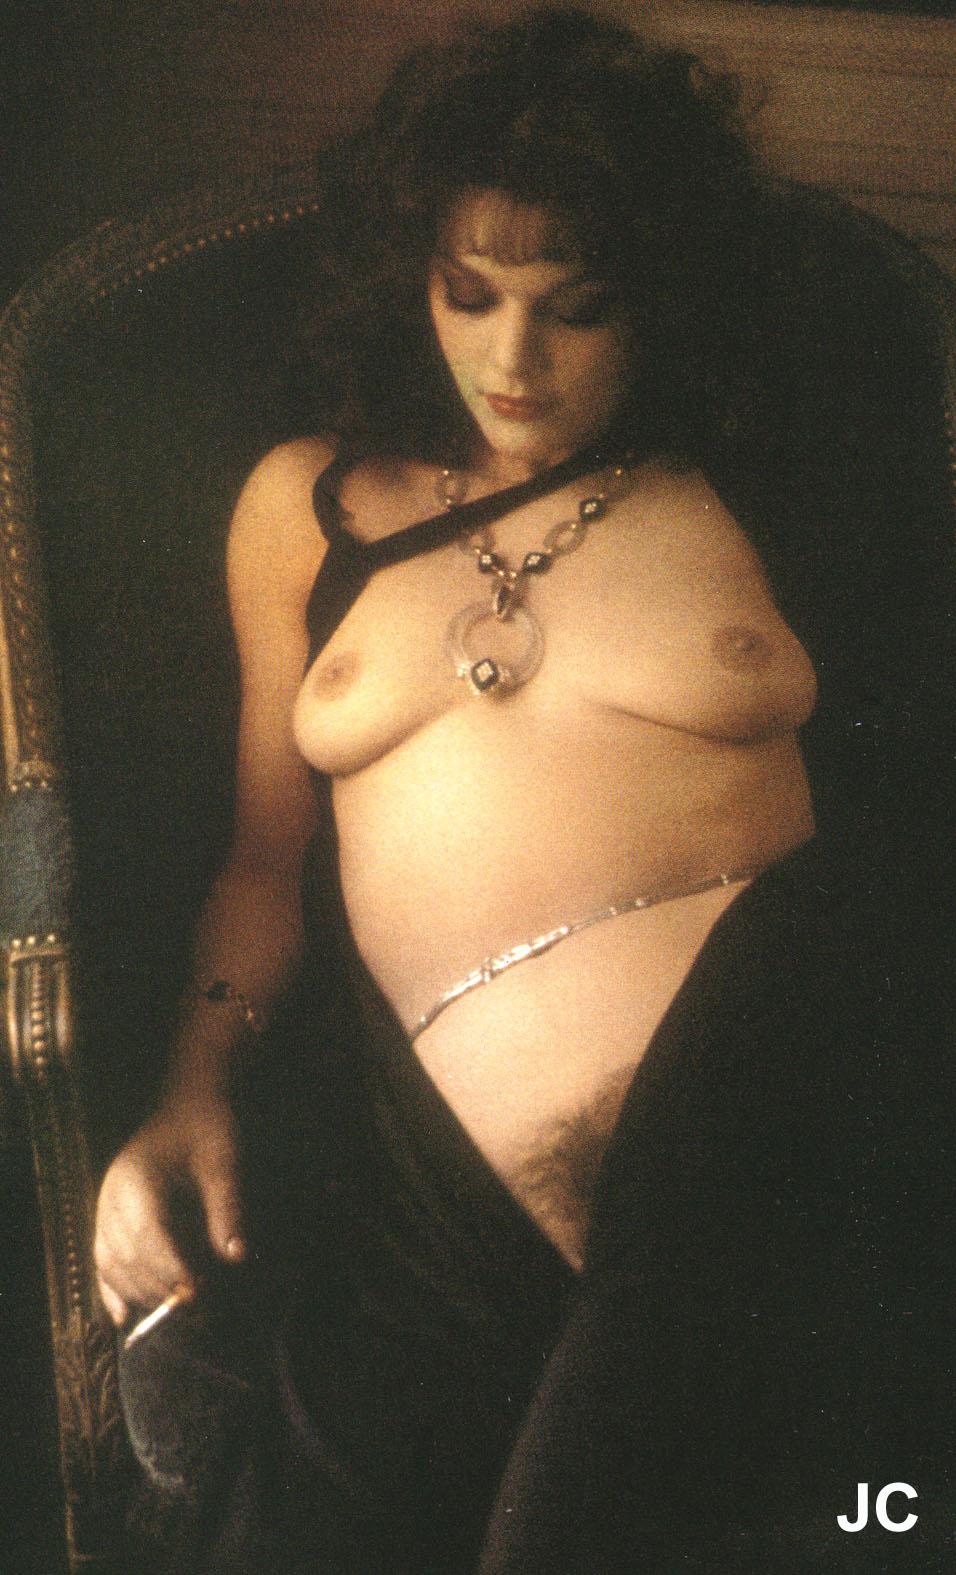 Яблочко tina majorino nude naked very talented